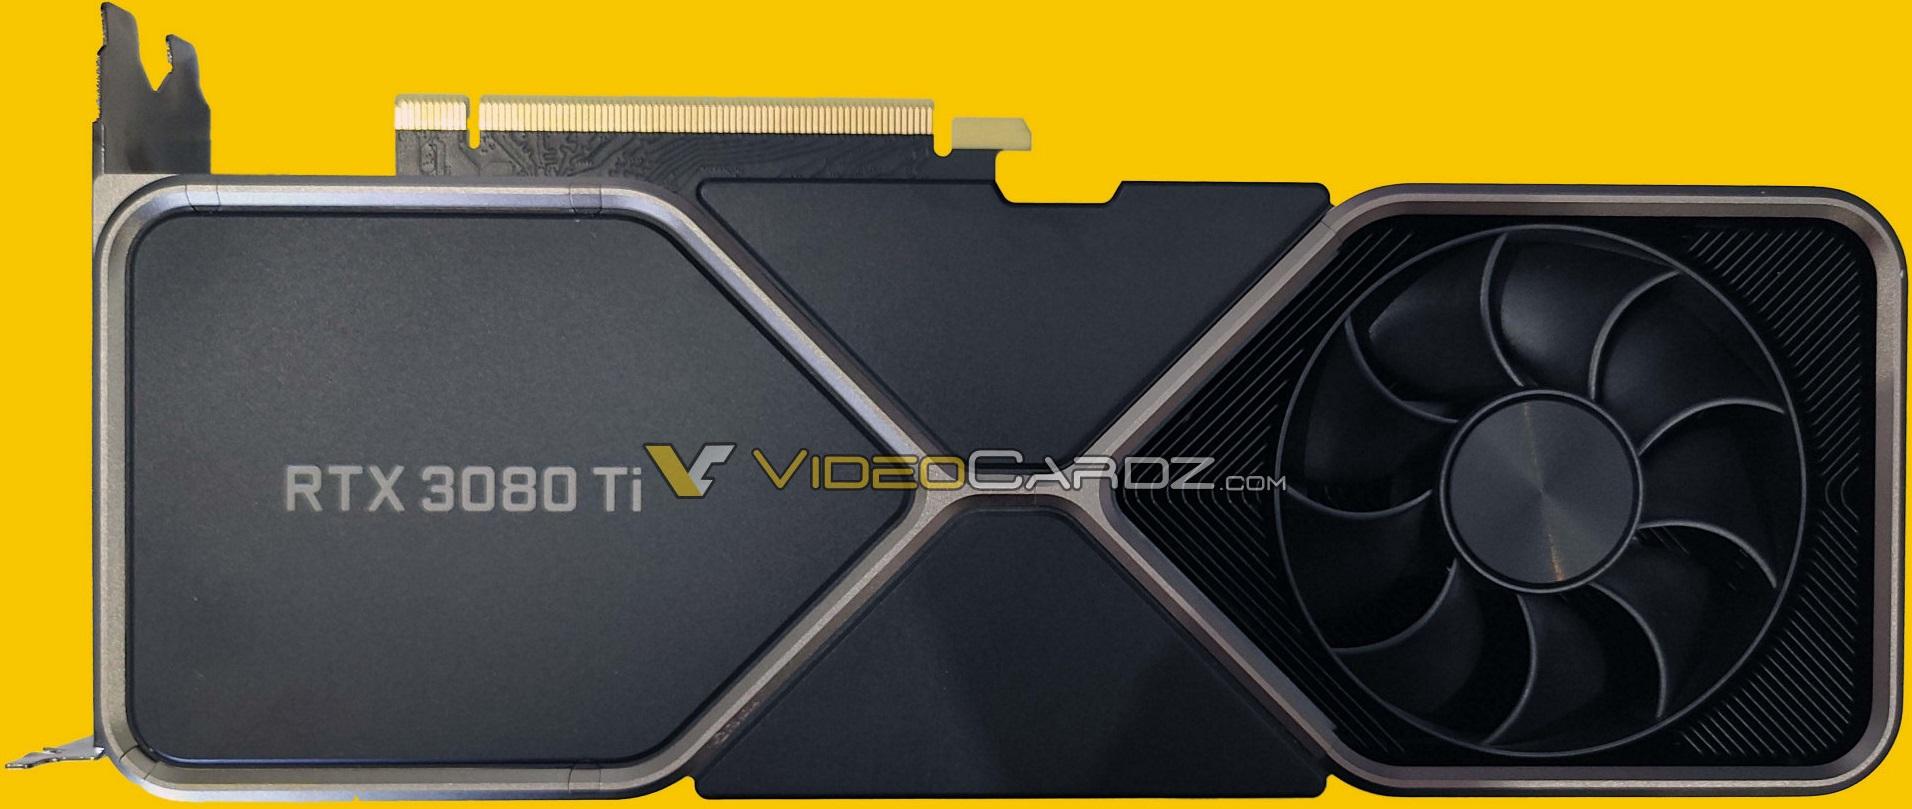 GeForce RTX 3080 Ti Founders Edition унаследовала систему охлаждения от GeForce RTX 3080